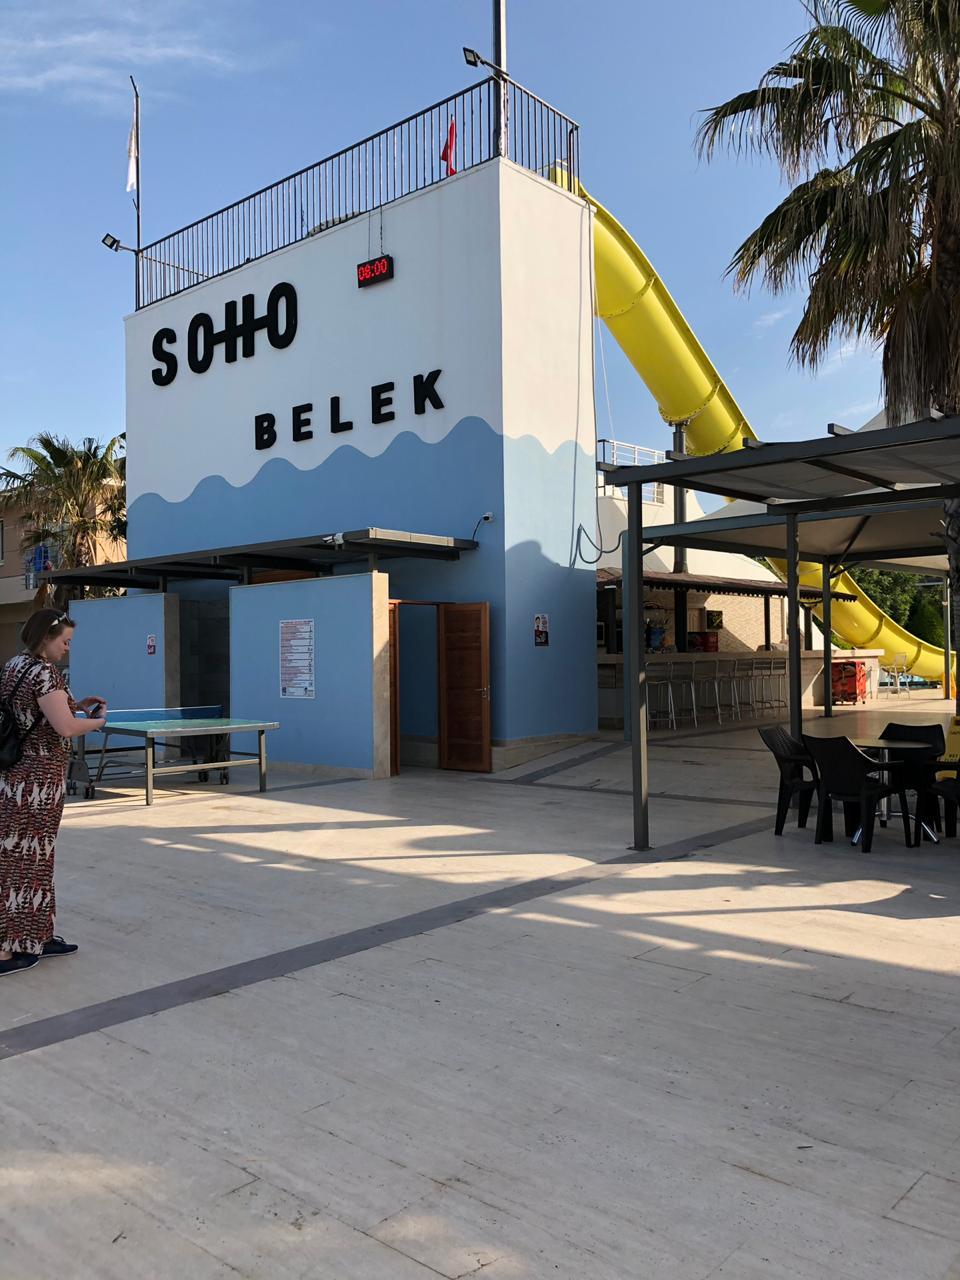 Туроператор «Интурист» - Отдых с Интурист в BELEK SOHO BEACH HOTEL 5 *